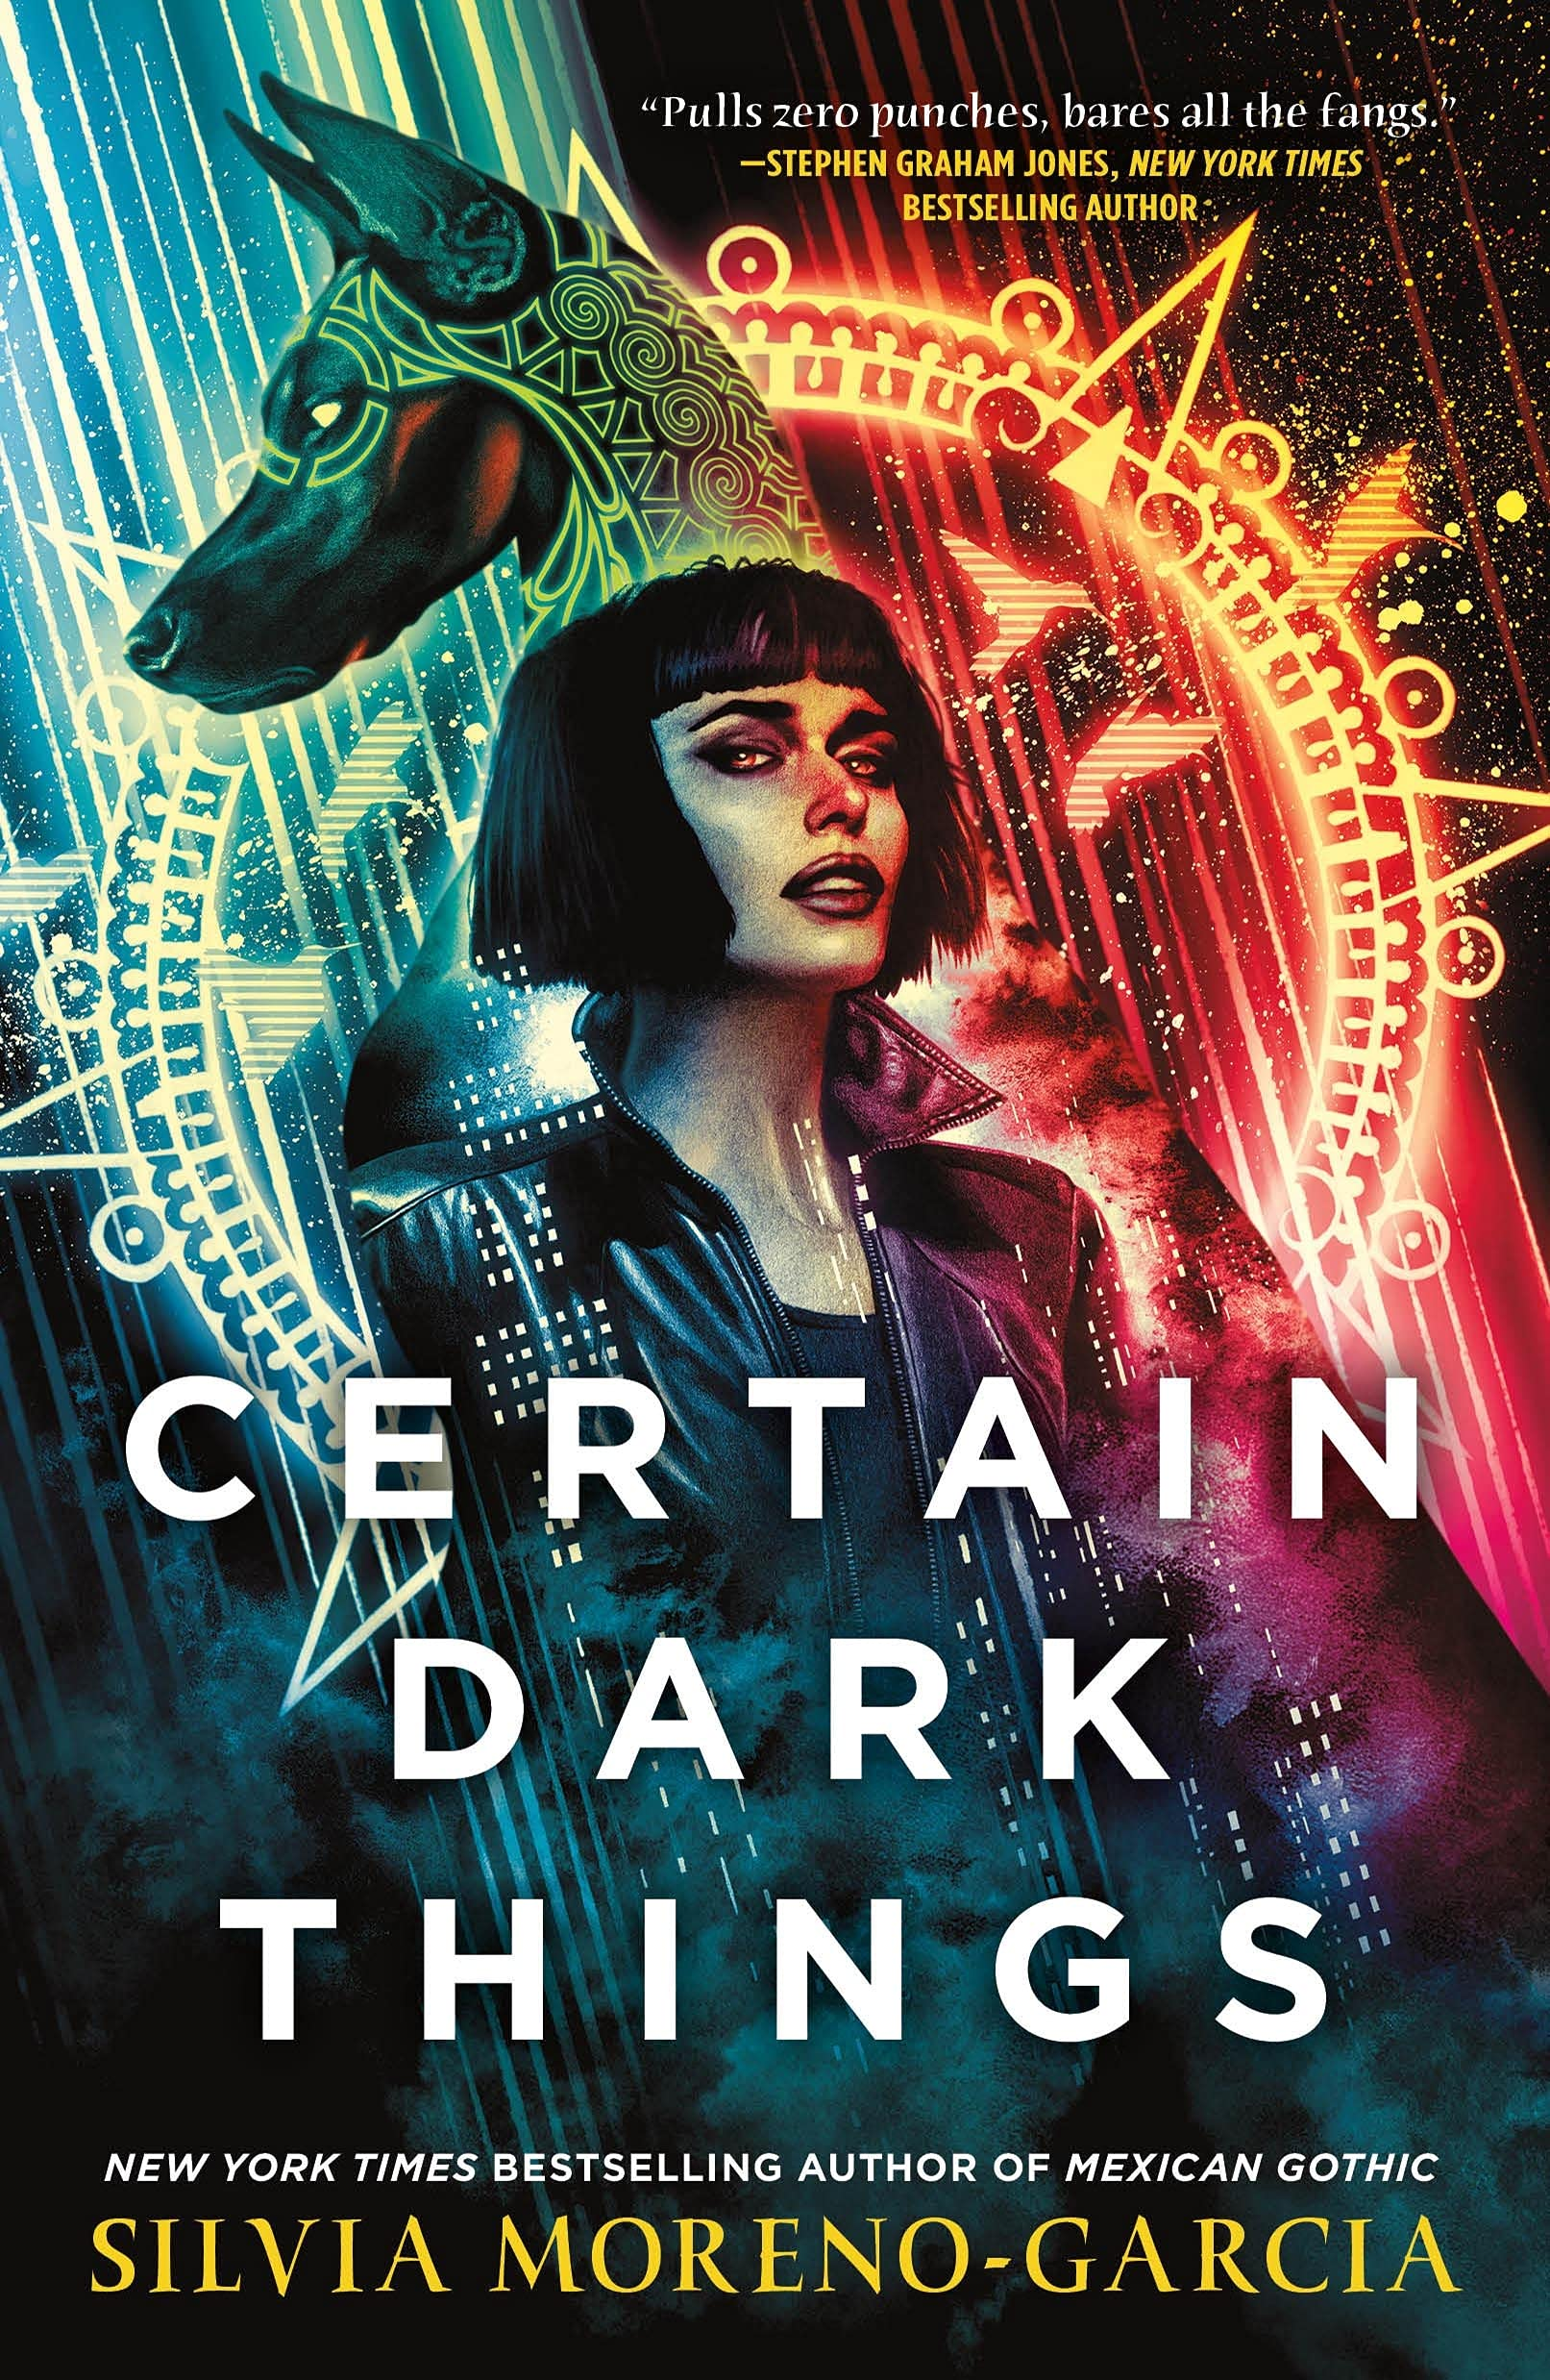 Book cover: Certain Dark Things - Silvia Moreno-Garcia (Jo Fletcher Books)